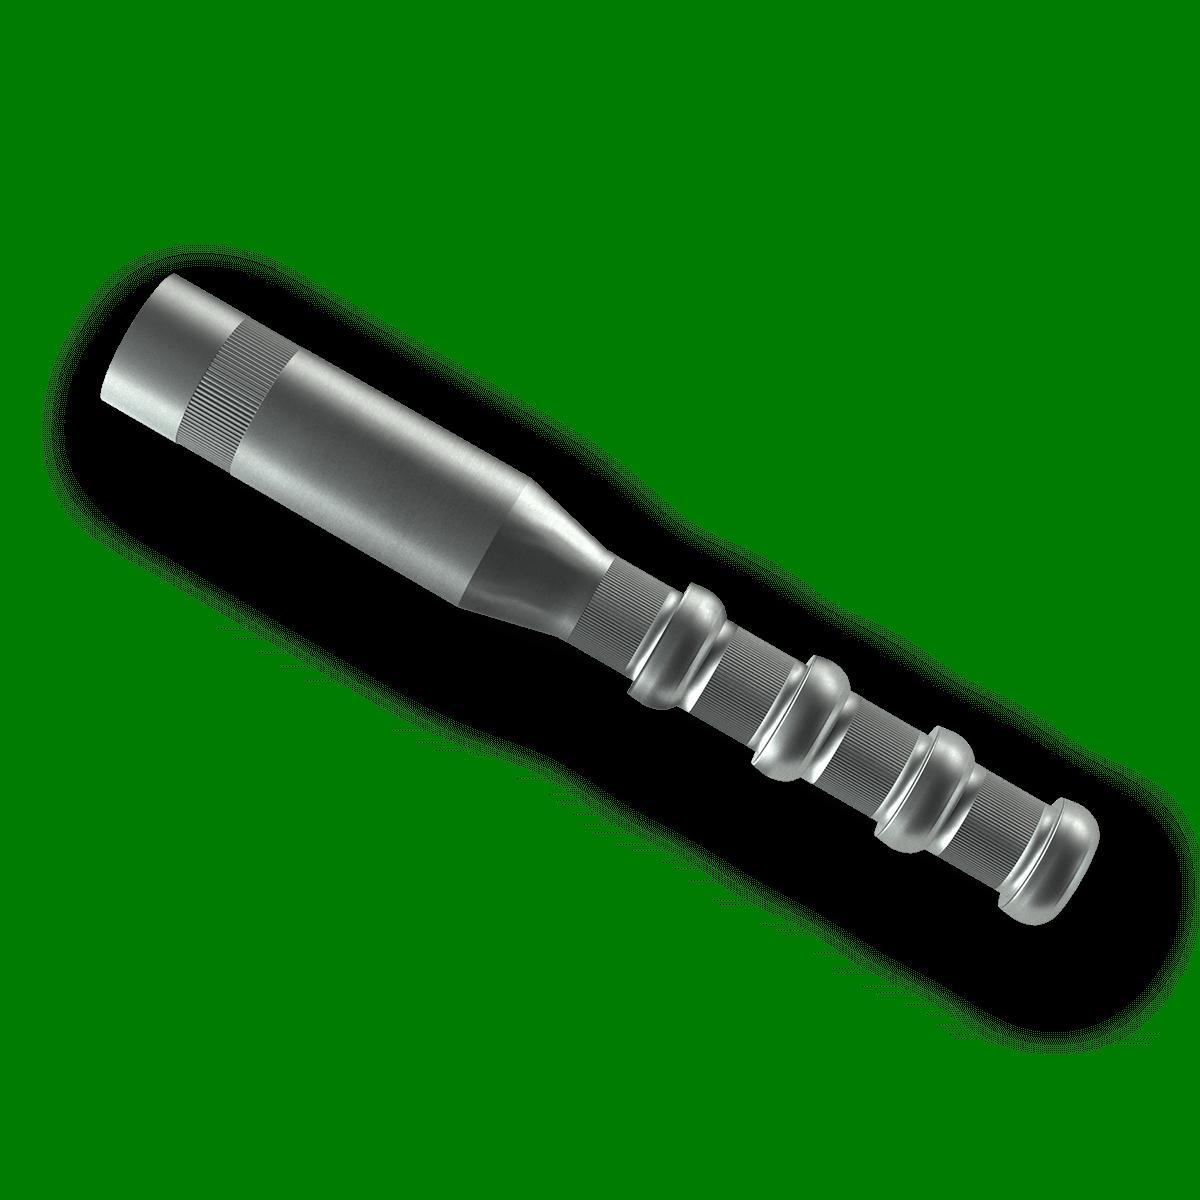 POWER-Sert™ Adhesive Insert Anchor — Type 316 Stainless Steel